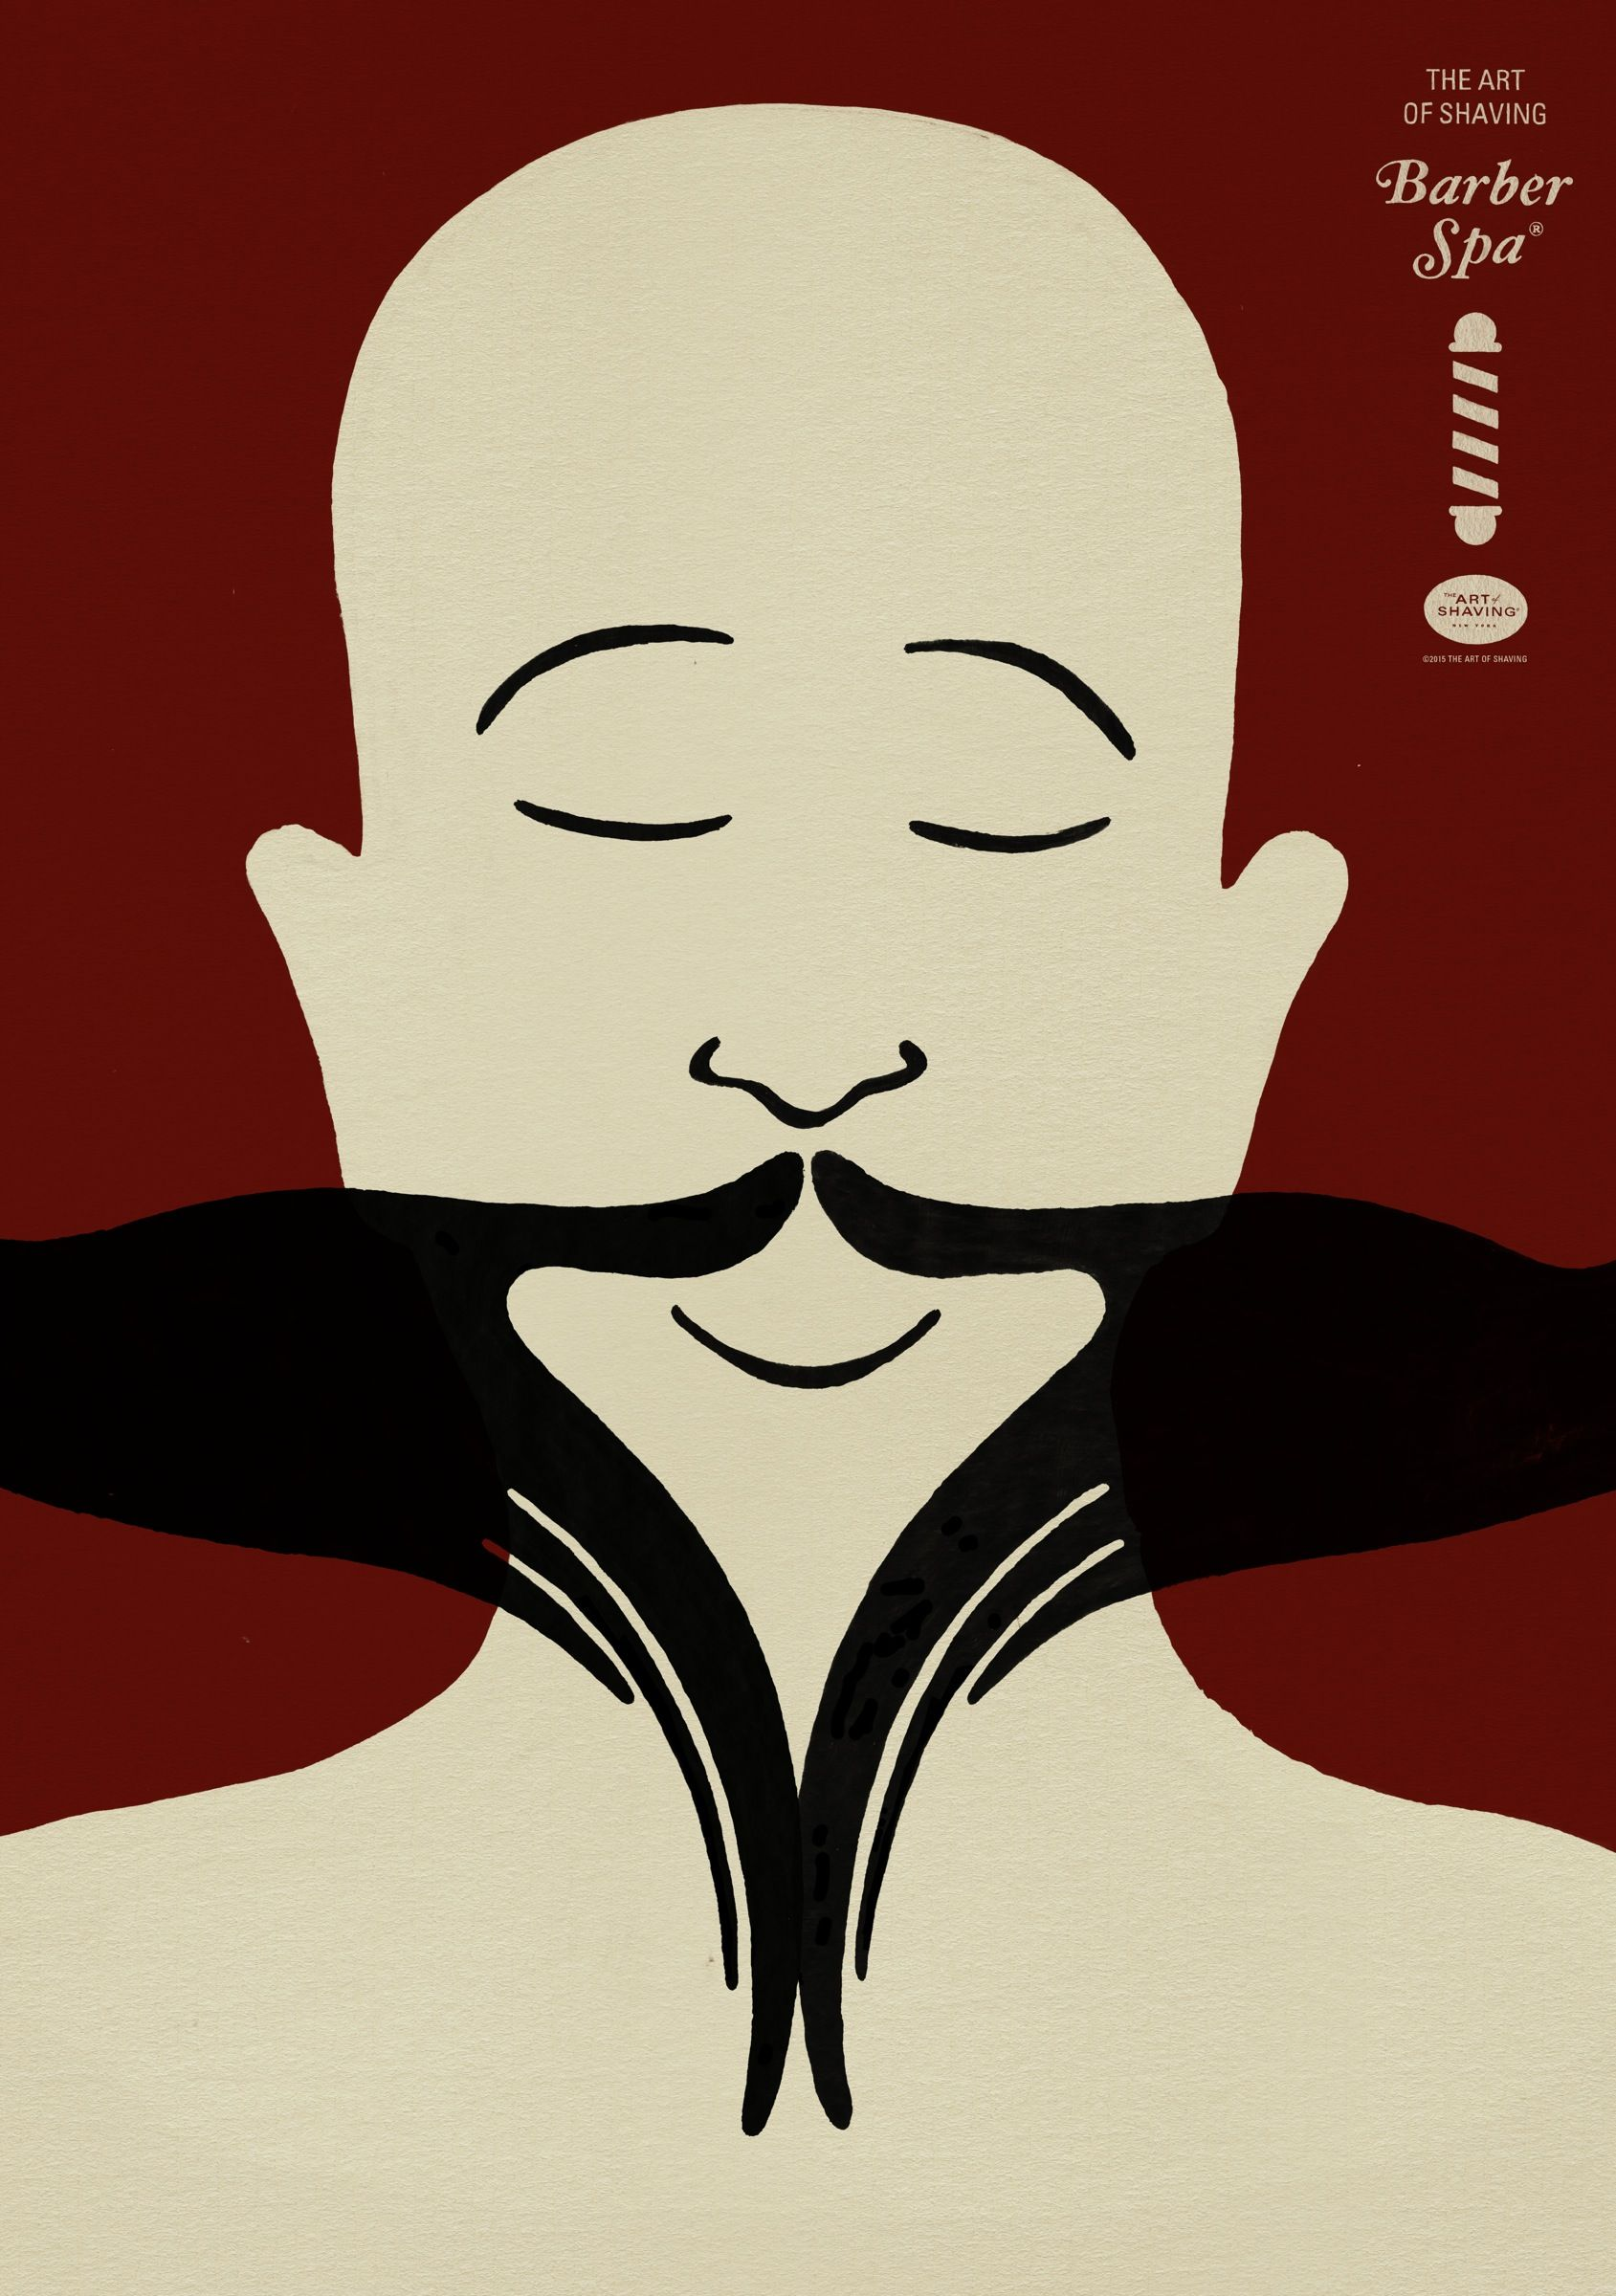 The Art Of Shaving Barber Spa 2 Graphic Design Advertising Bbdo The Art Of Shaving